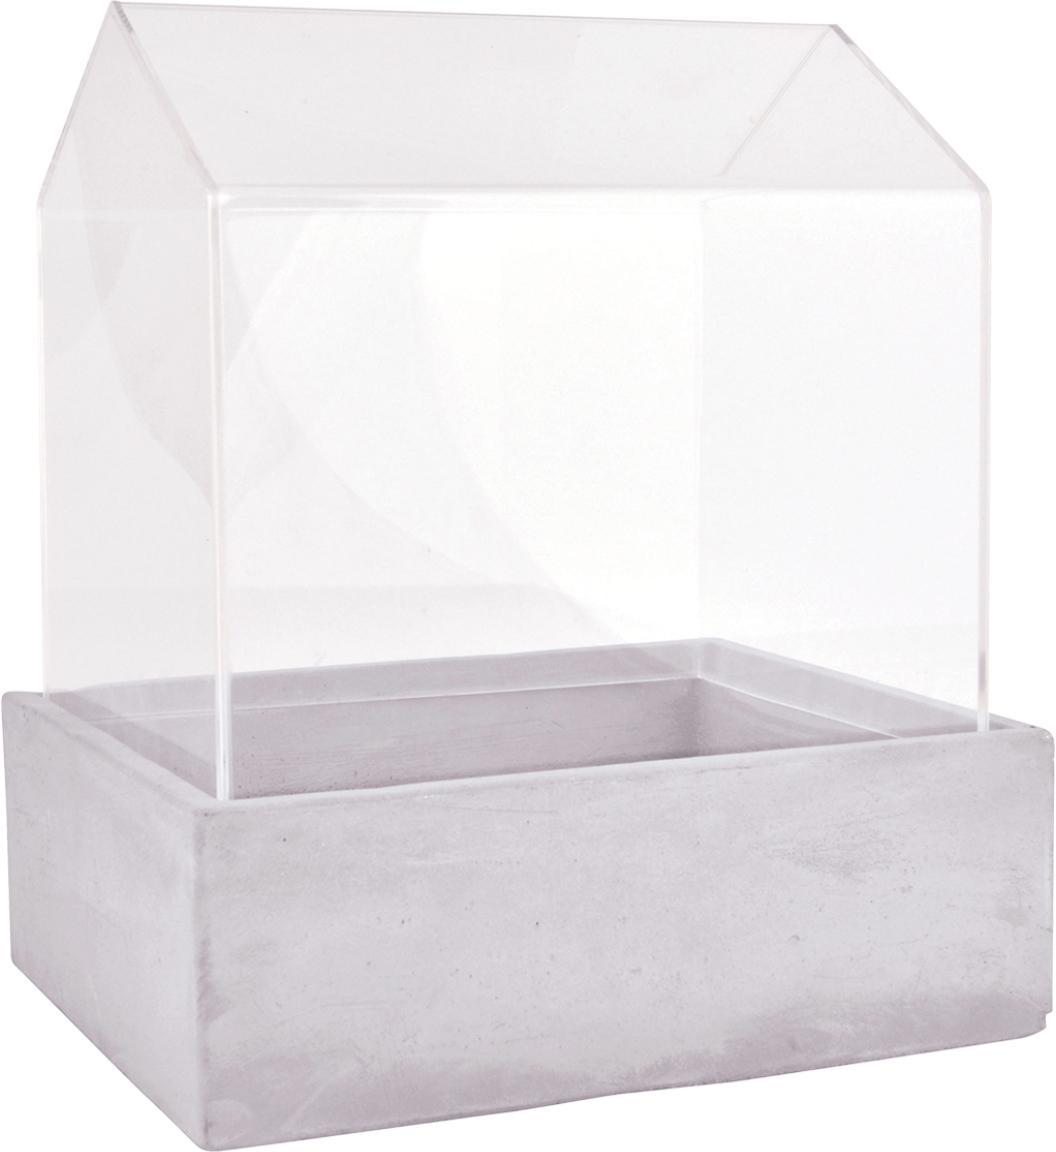 Invernadero Budi, Estructura: Acrylglas, Gris, transparente, An 24 x Al 28 cm